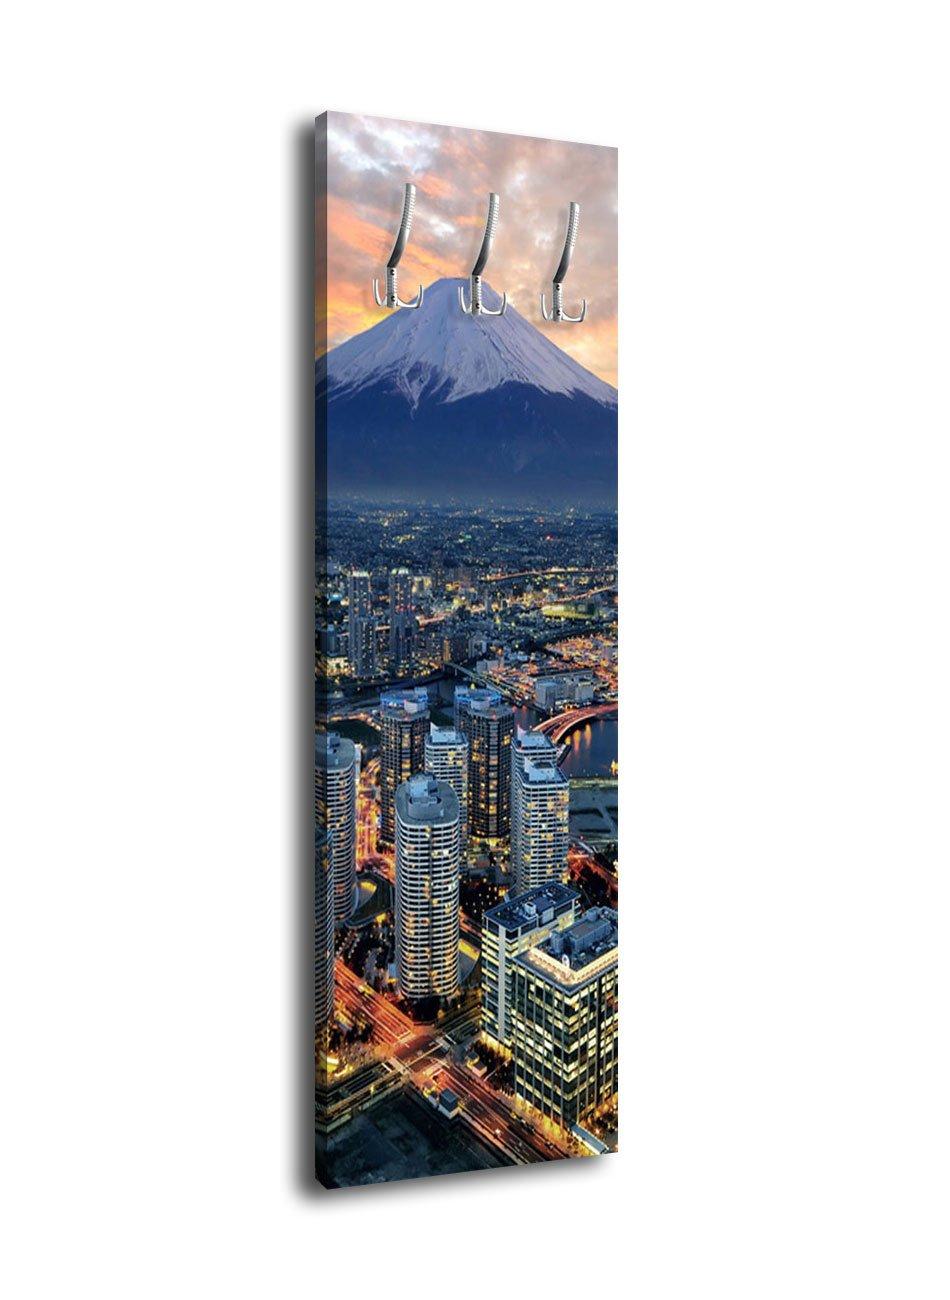 Wandmotiv24 Garderobe mit Design Yokohama Mt. Fuji G392 40x125cm Wandgarderobe Japan Küste Fuji